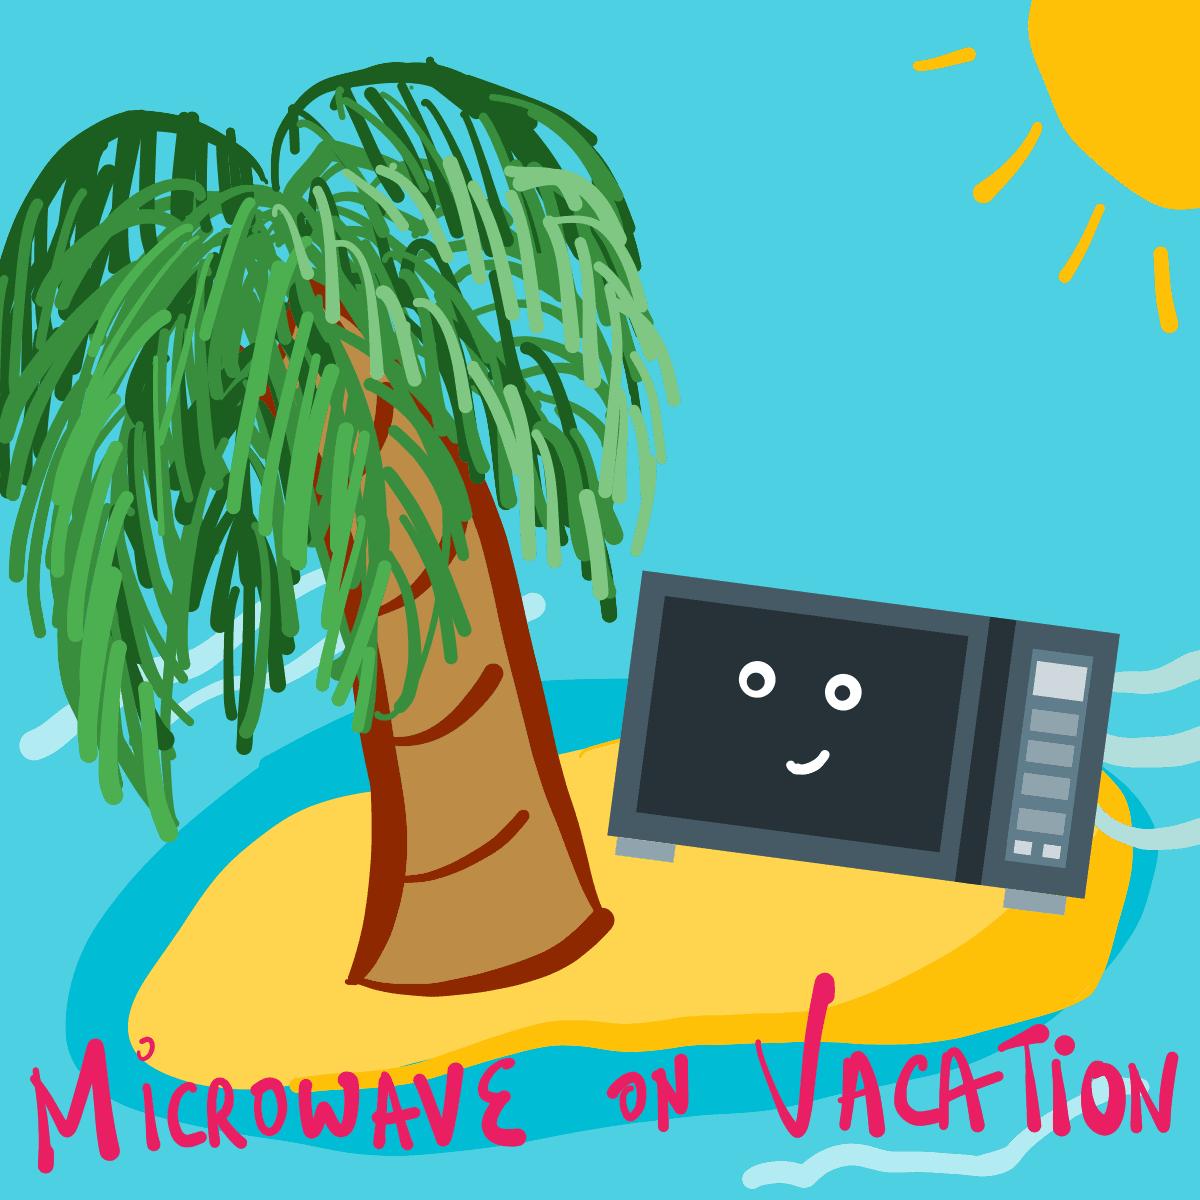 An illustration of a microwave on a beach